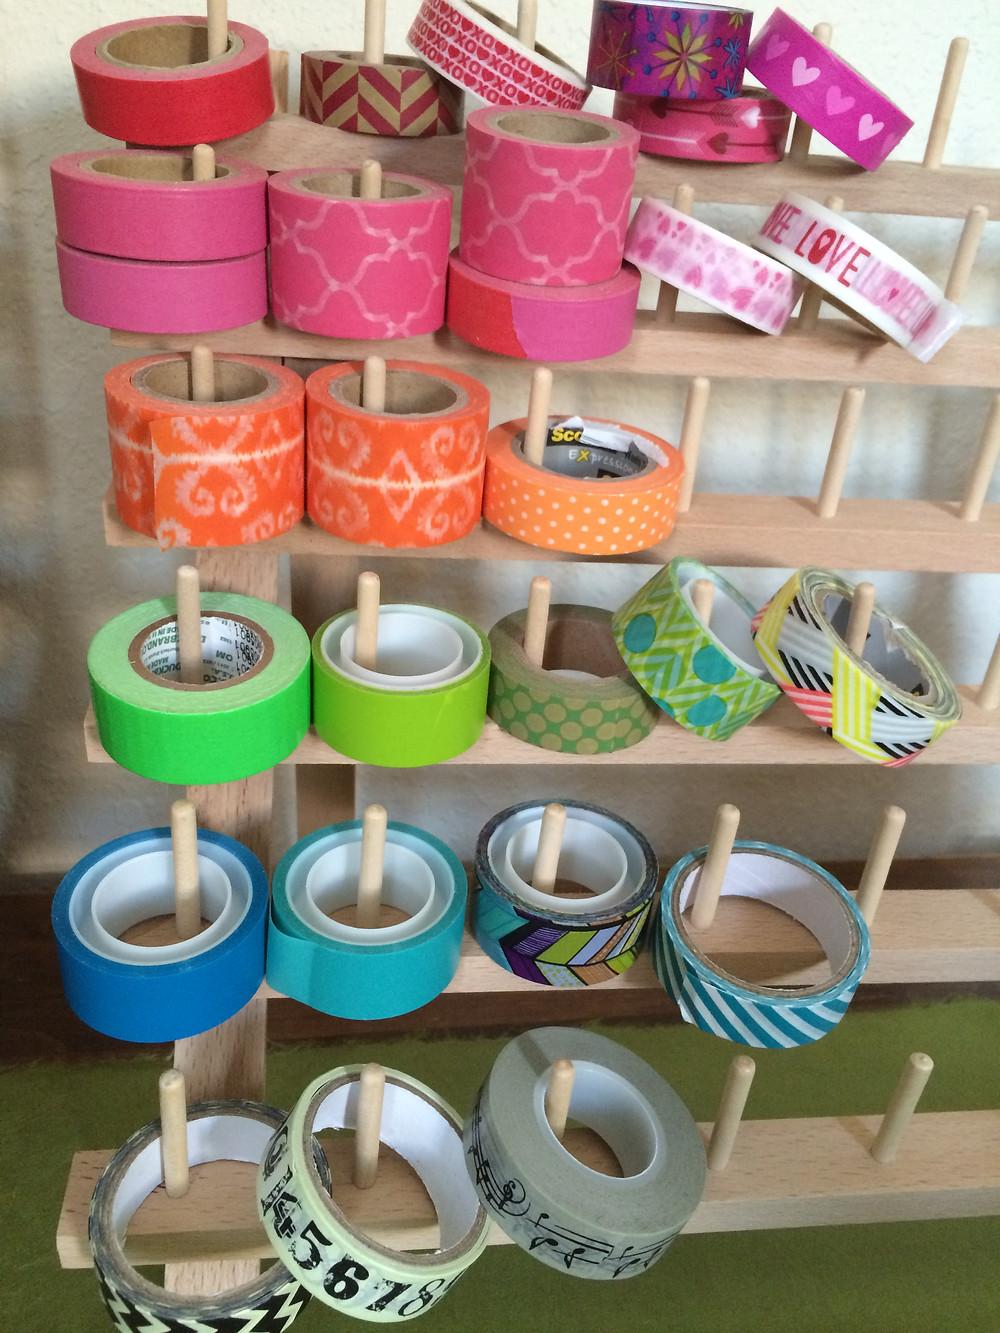 Washi tape stored on spool holder